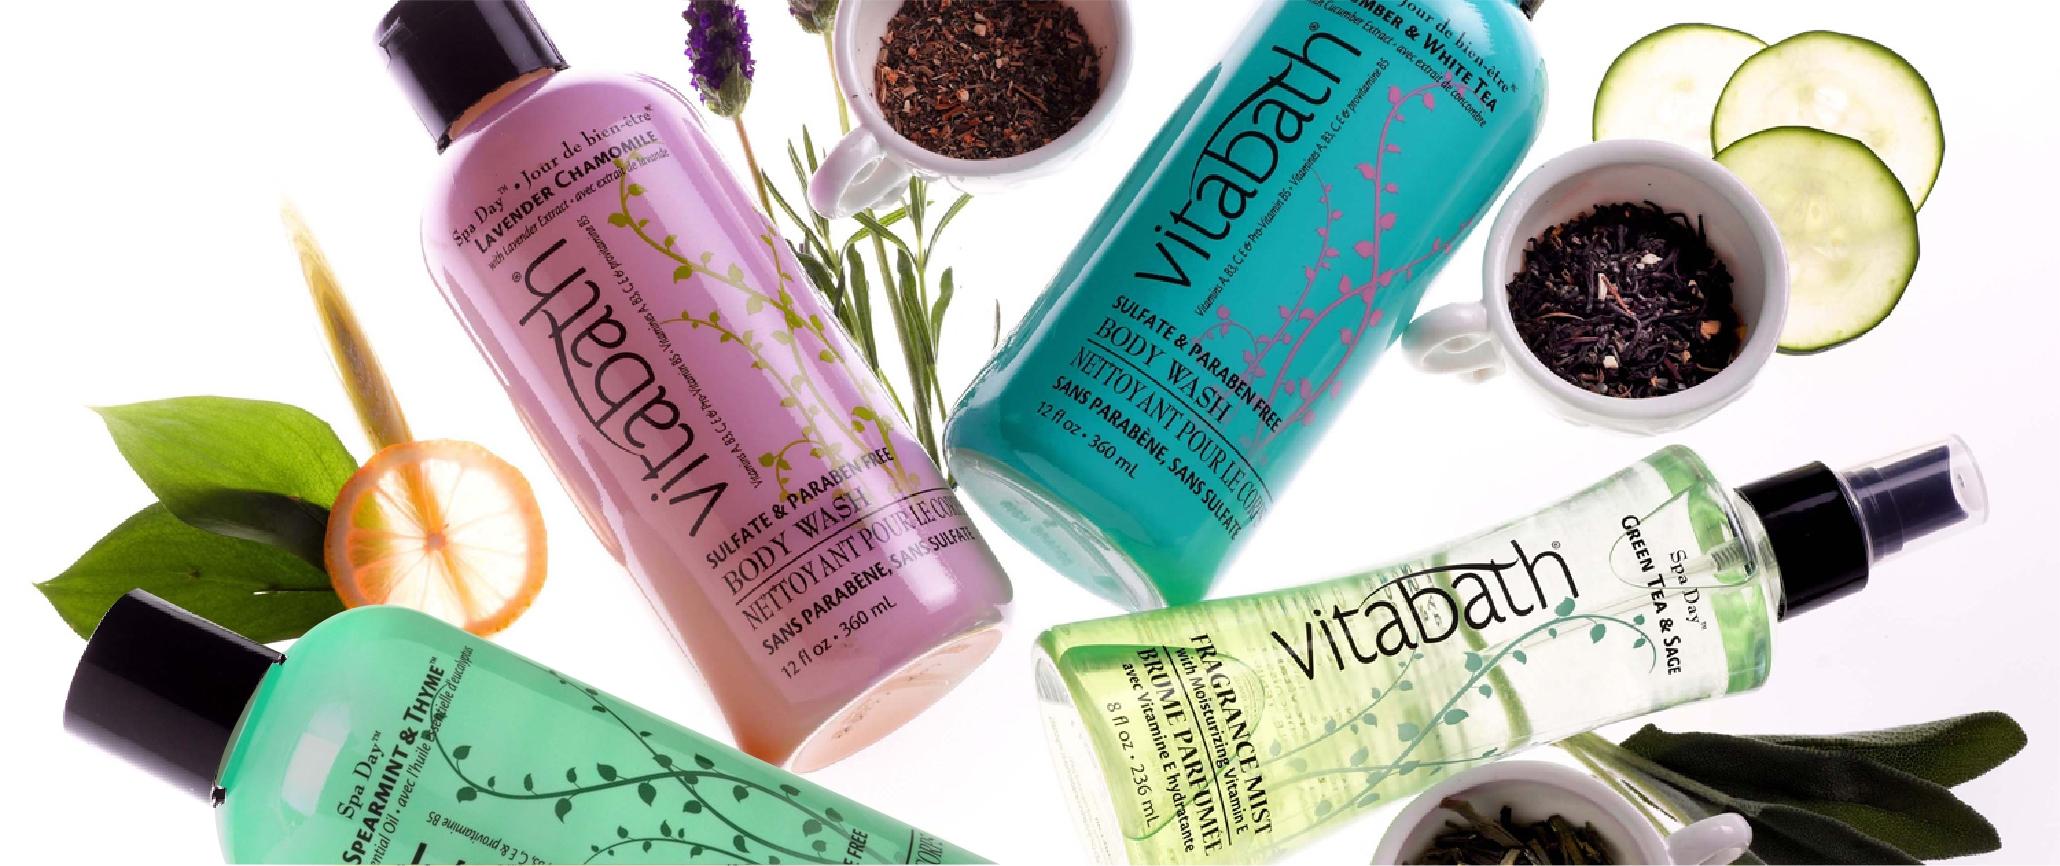 fragrance-withspearmint-thyme2.jpg